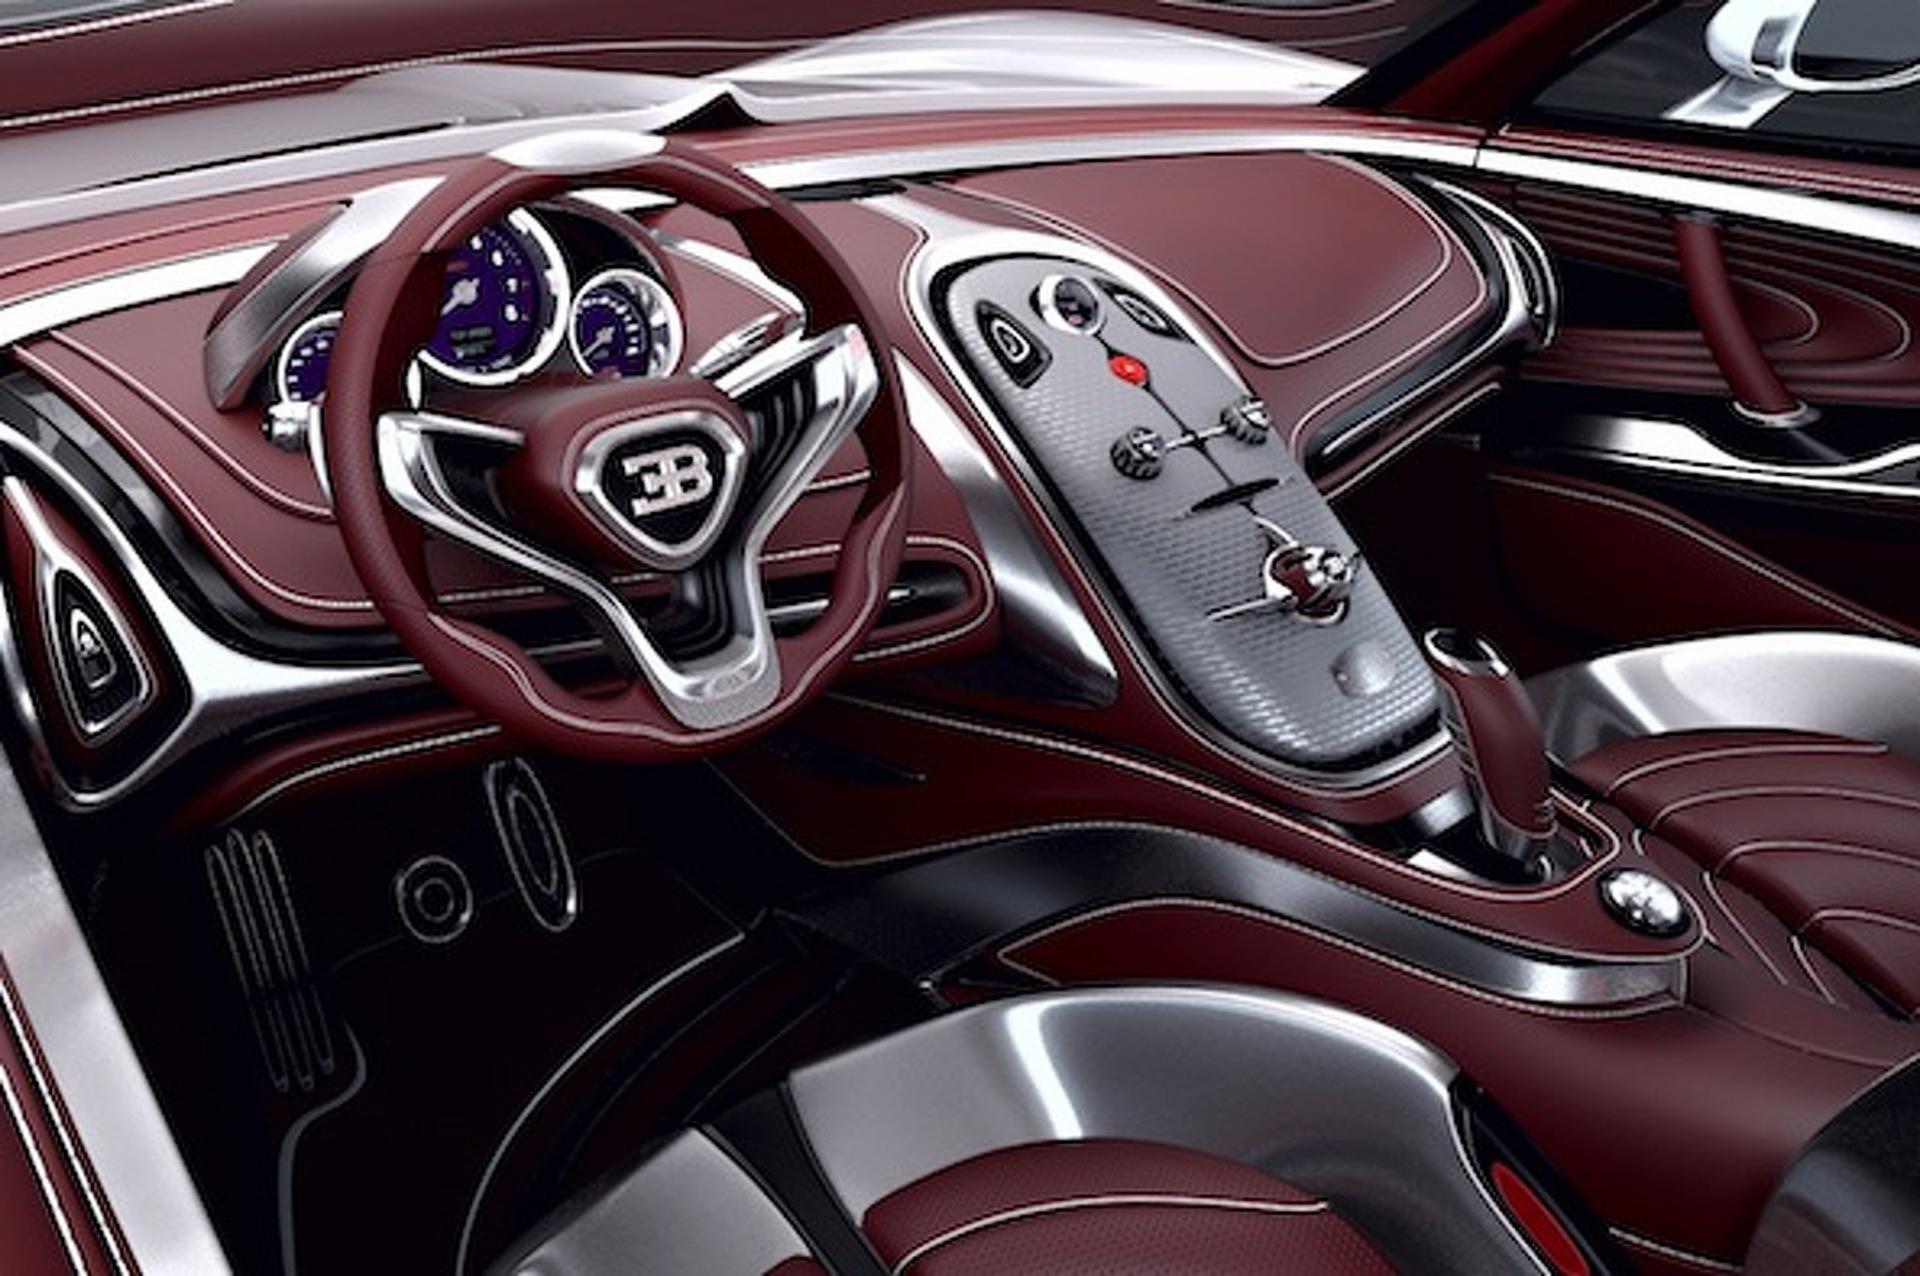 Bugatti Gangloff Concept: A Vision of the Veyron?